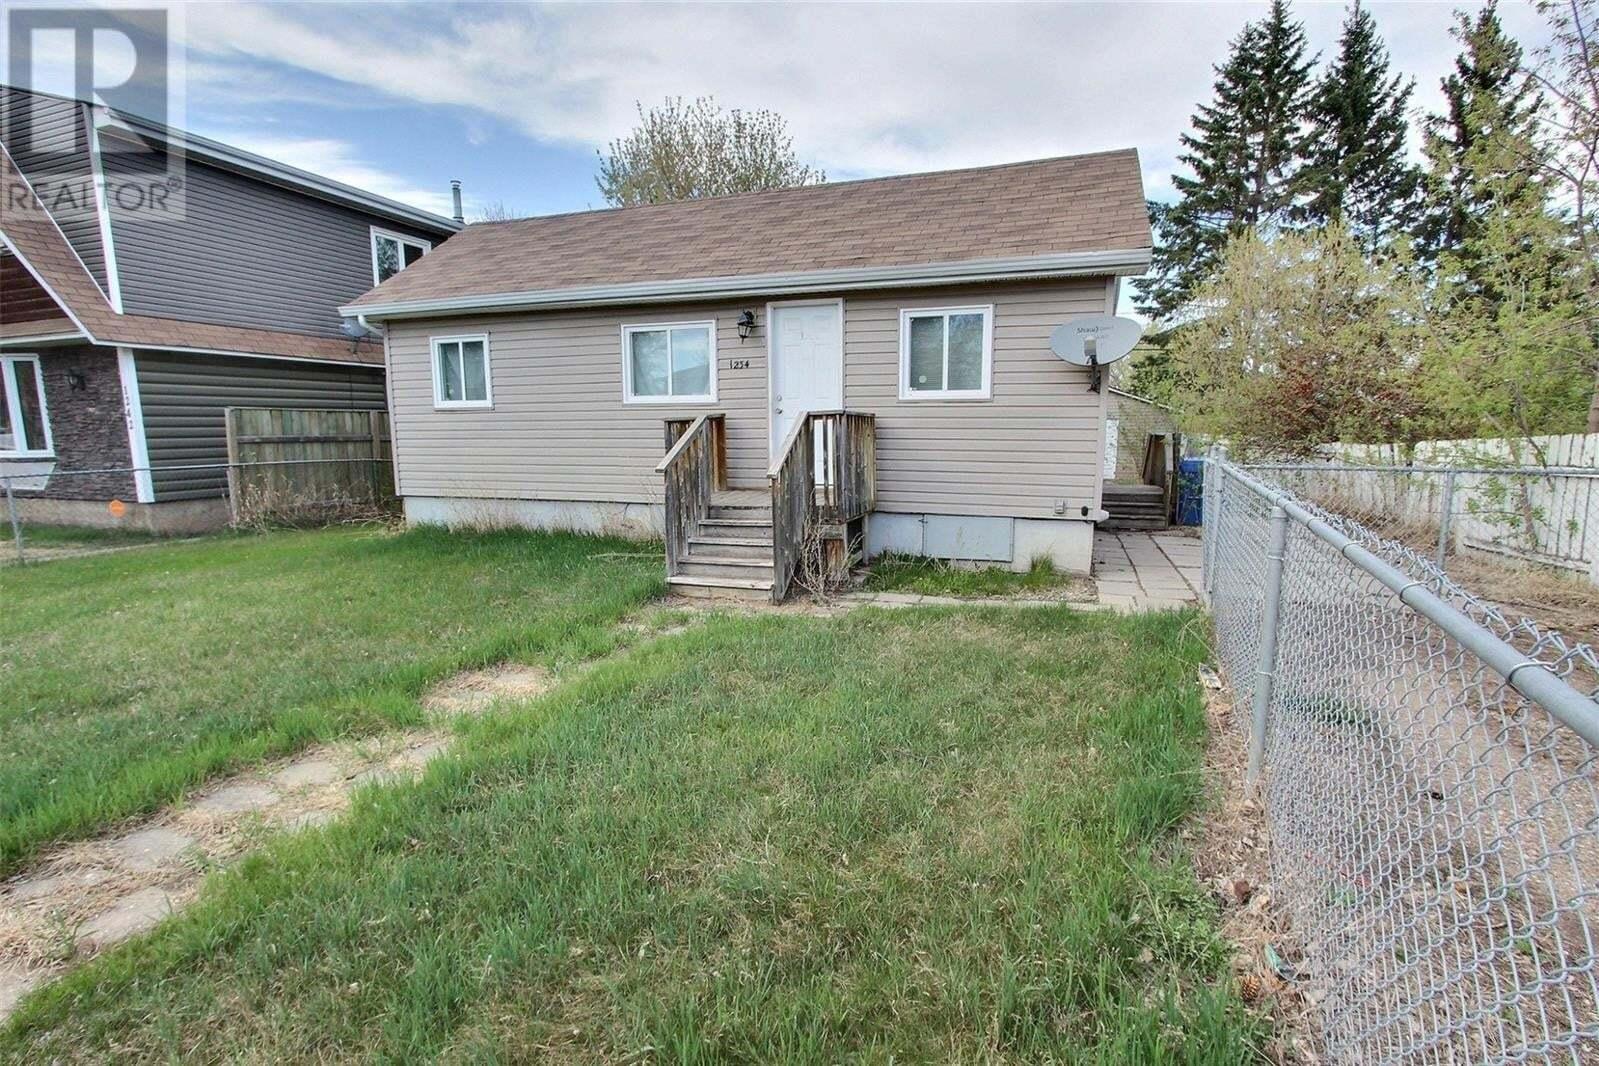 House for sale at 1234 15th St W Prince Albert Saskatchewan - MLS: SK826089